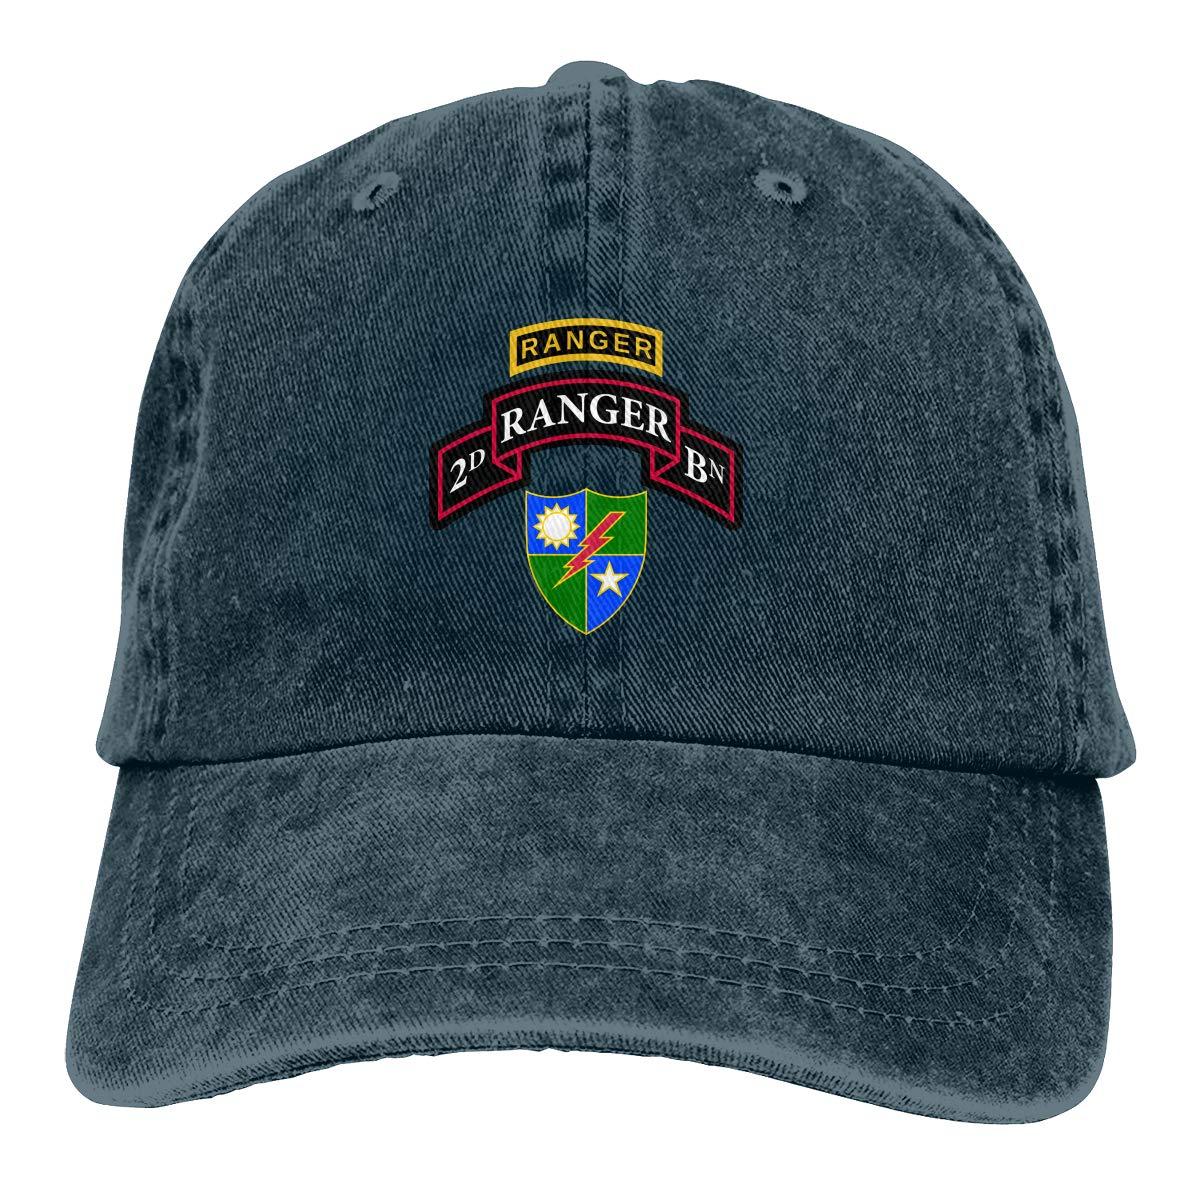 Sajfirlug US Army Retro 2nd Ranger Battalion Fashion Adjustable Cowboy Cap Denim Hat for Women and Men